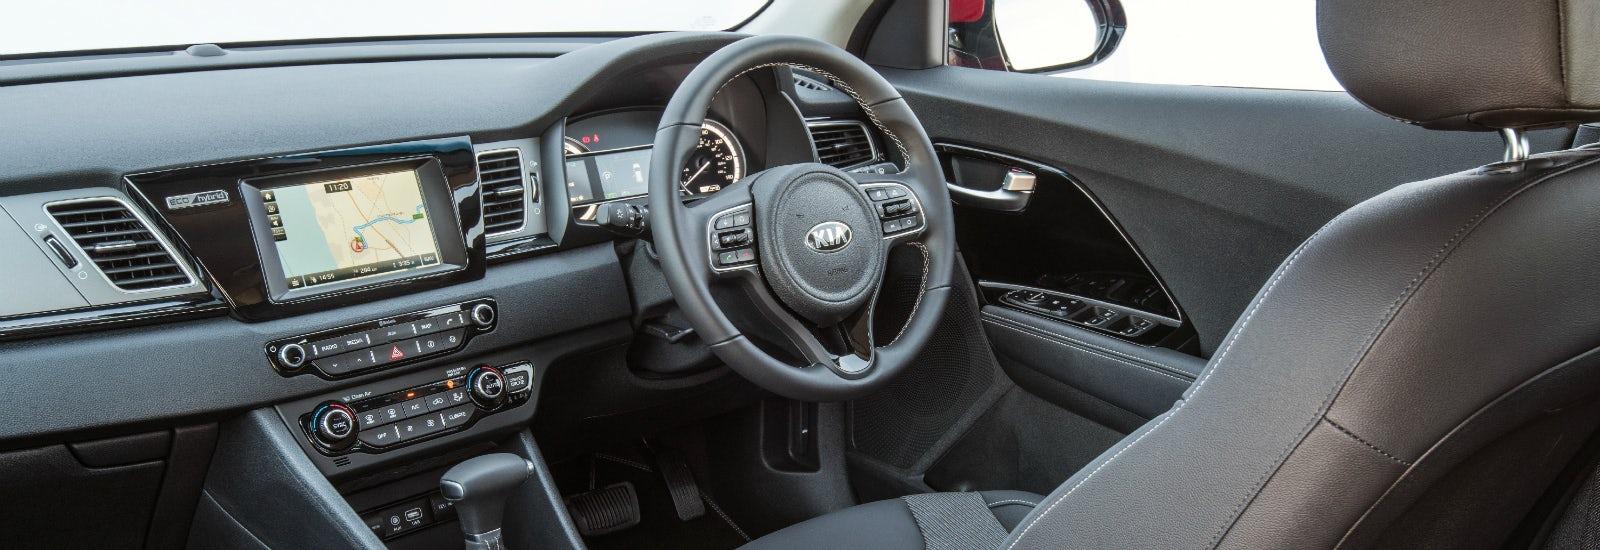 Kia niro hybrid suv size and dimensions guide carwow - Kia niro interior ...